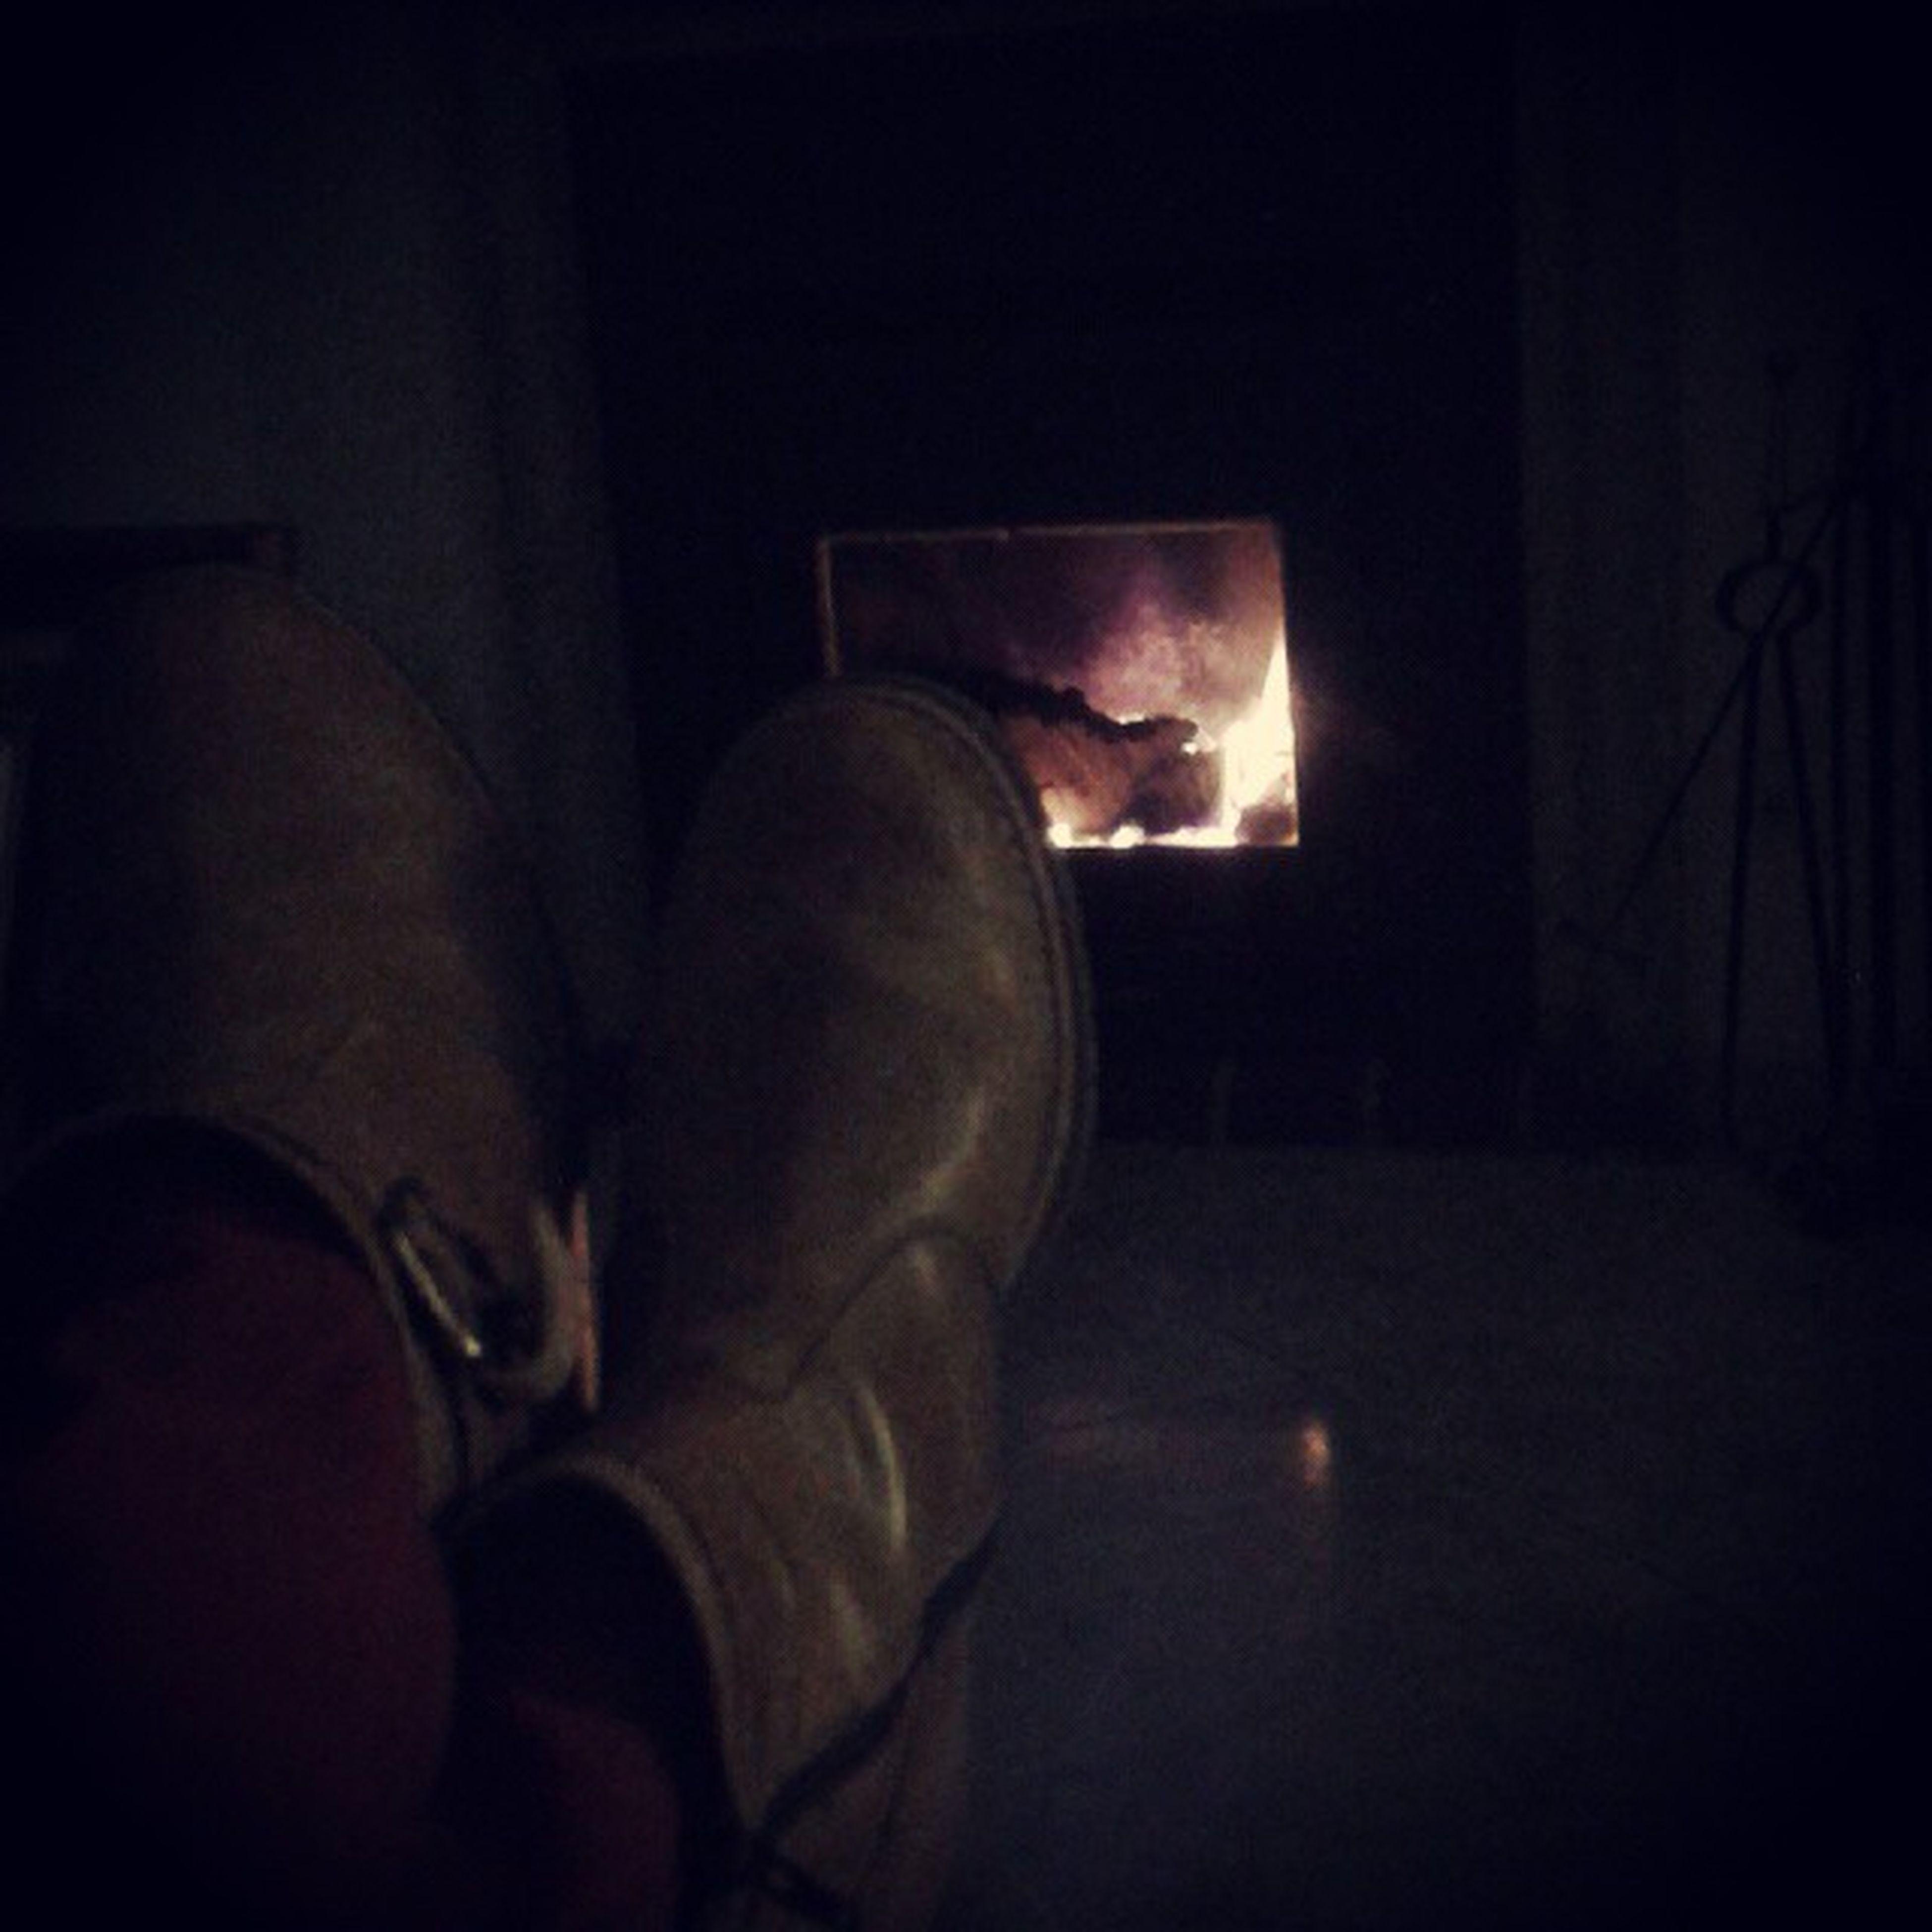 indoors, home interior, sofa, dark, illuminated, domestic room, room, window, bed, darkroom, house, sunlight, relaxation, bedroom, home, no people, flooring, floor, built structure, wall - building feature